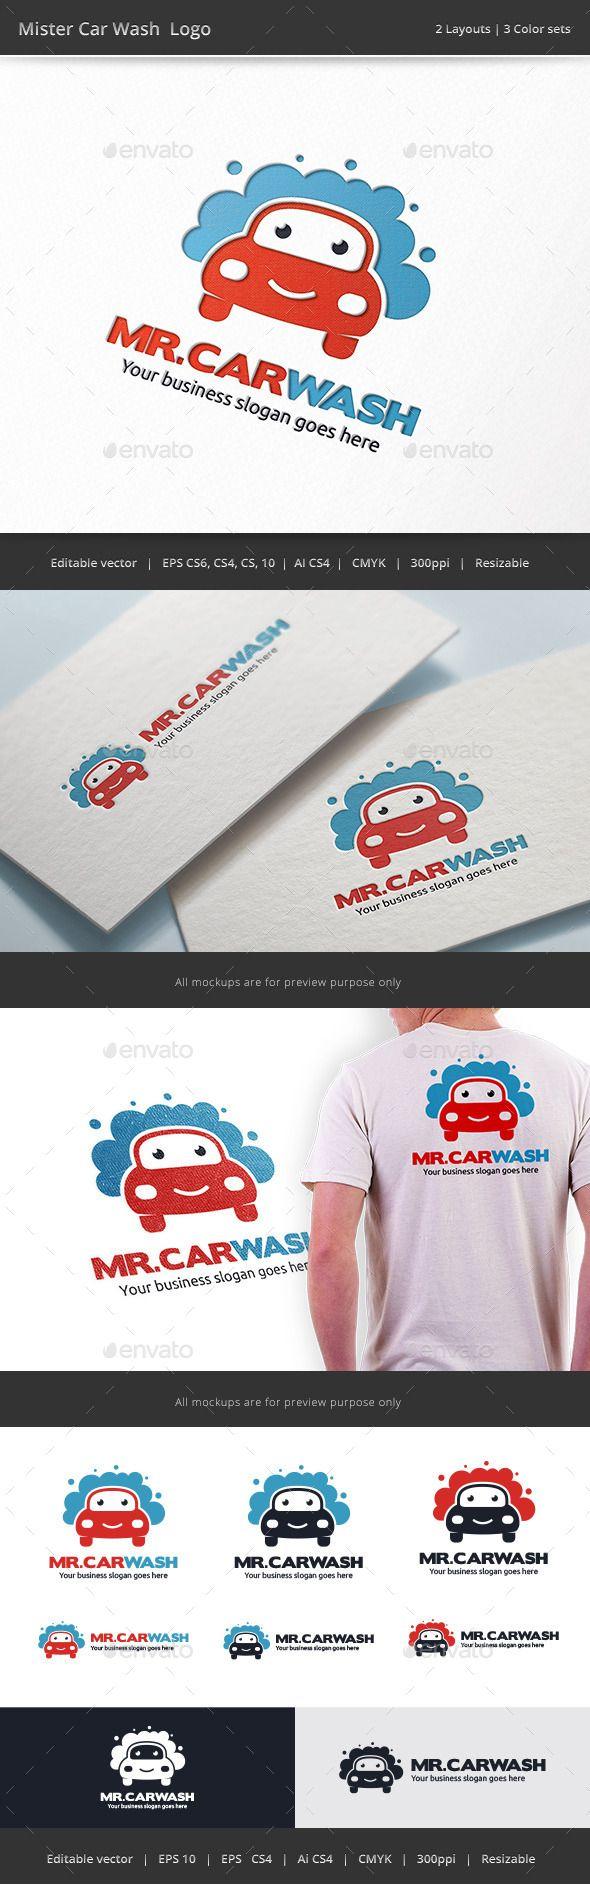 Car body sticker design eps - Mister Car Wash Logo Design Template Vector Logotype Download It Here Http